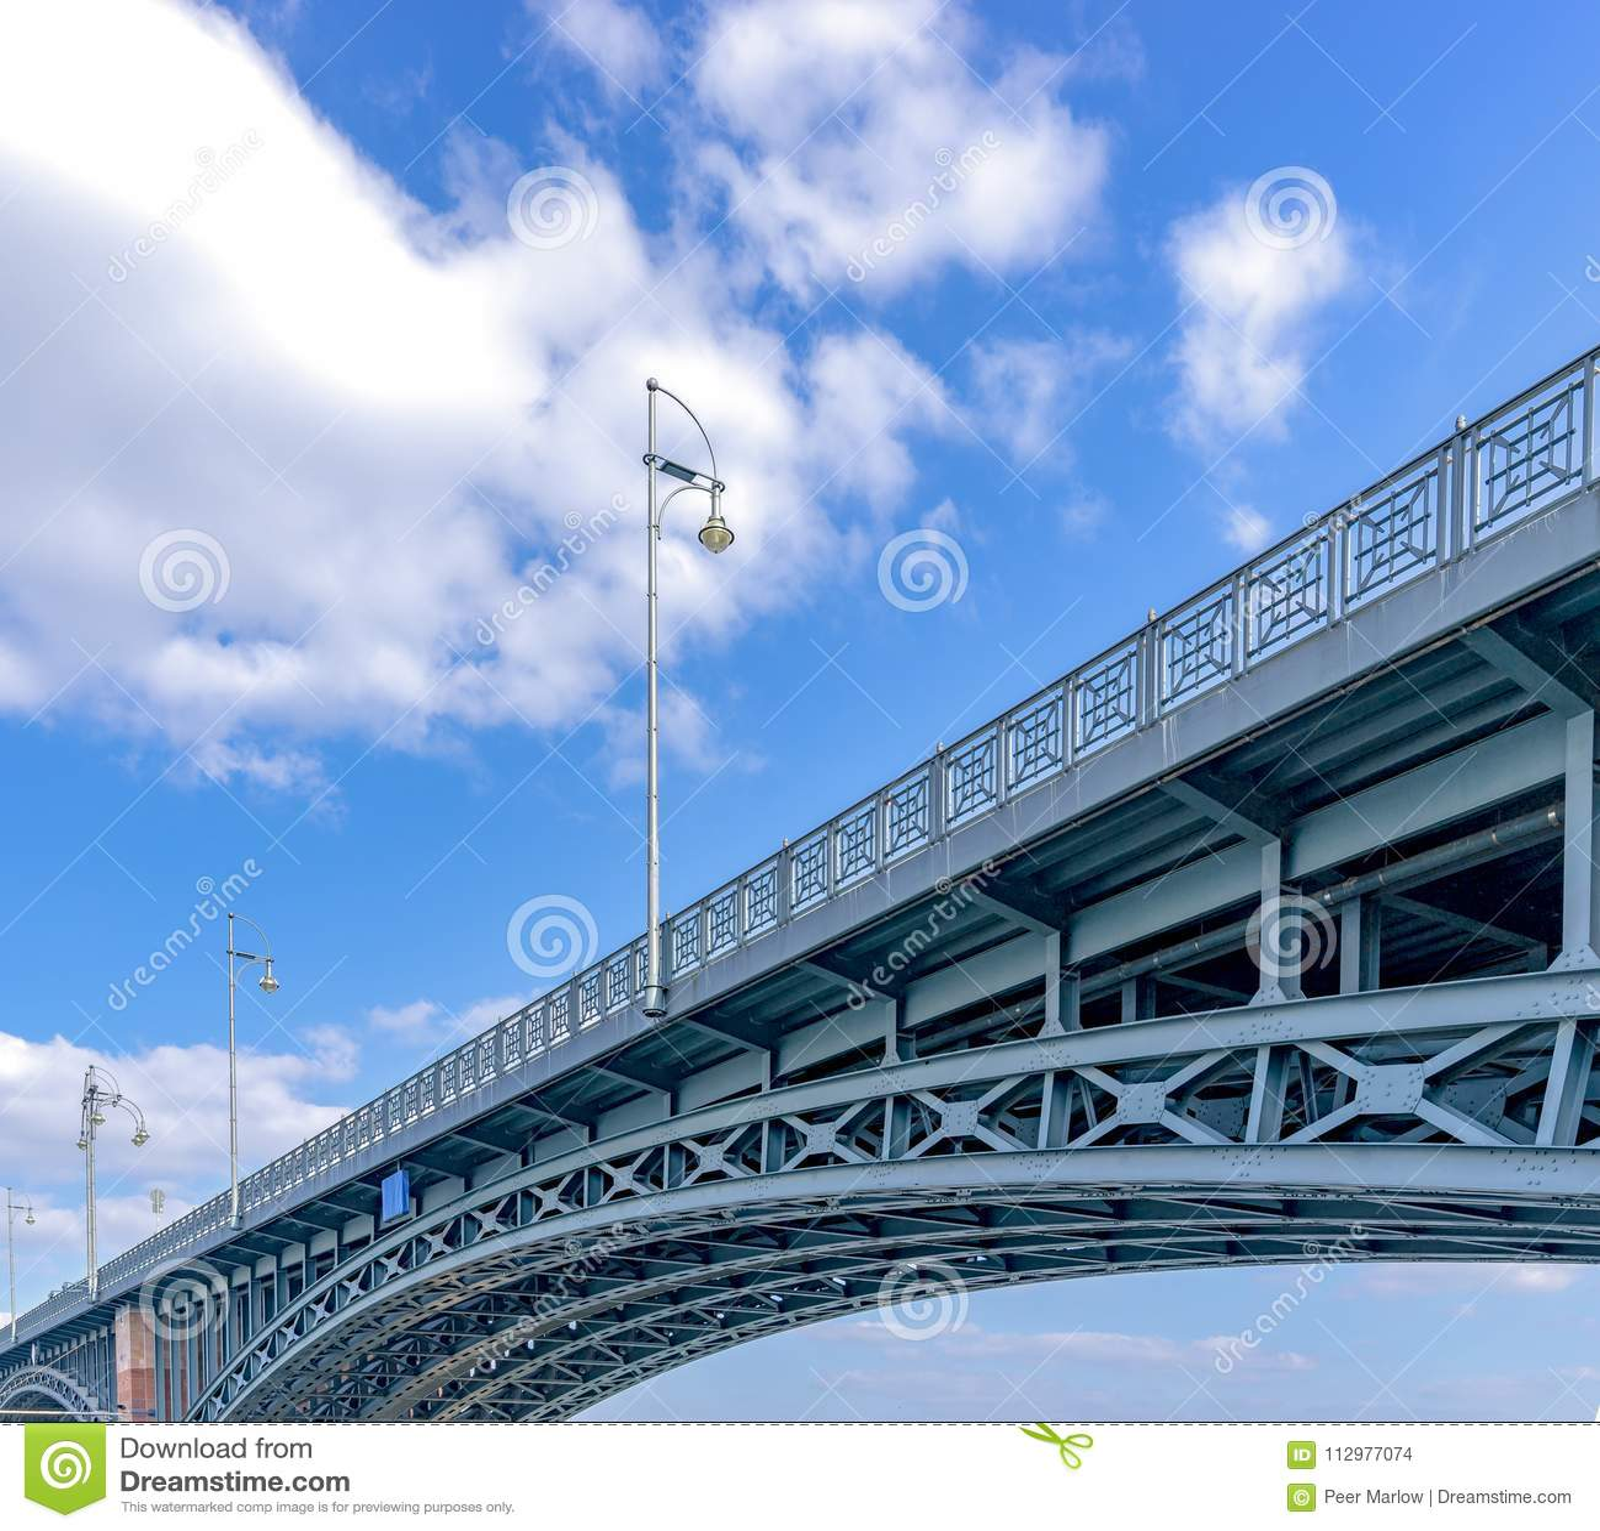 The Theodor-Heuss Bridge connects Mainz Kastel City with Wiesbaden City